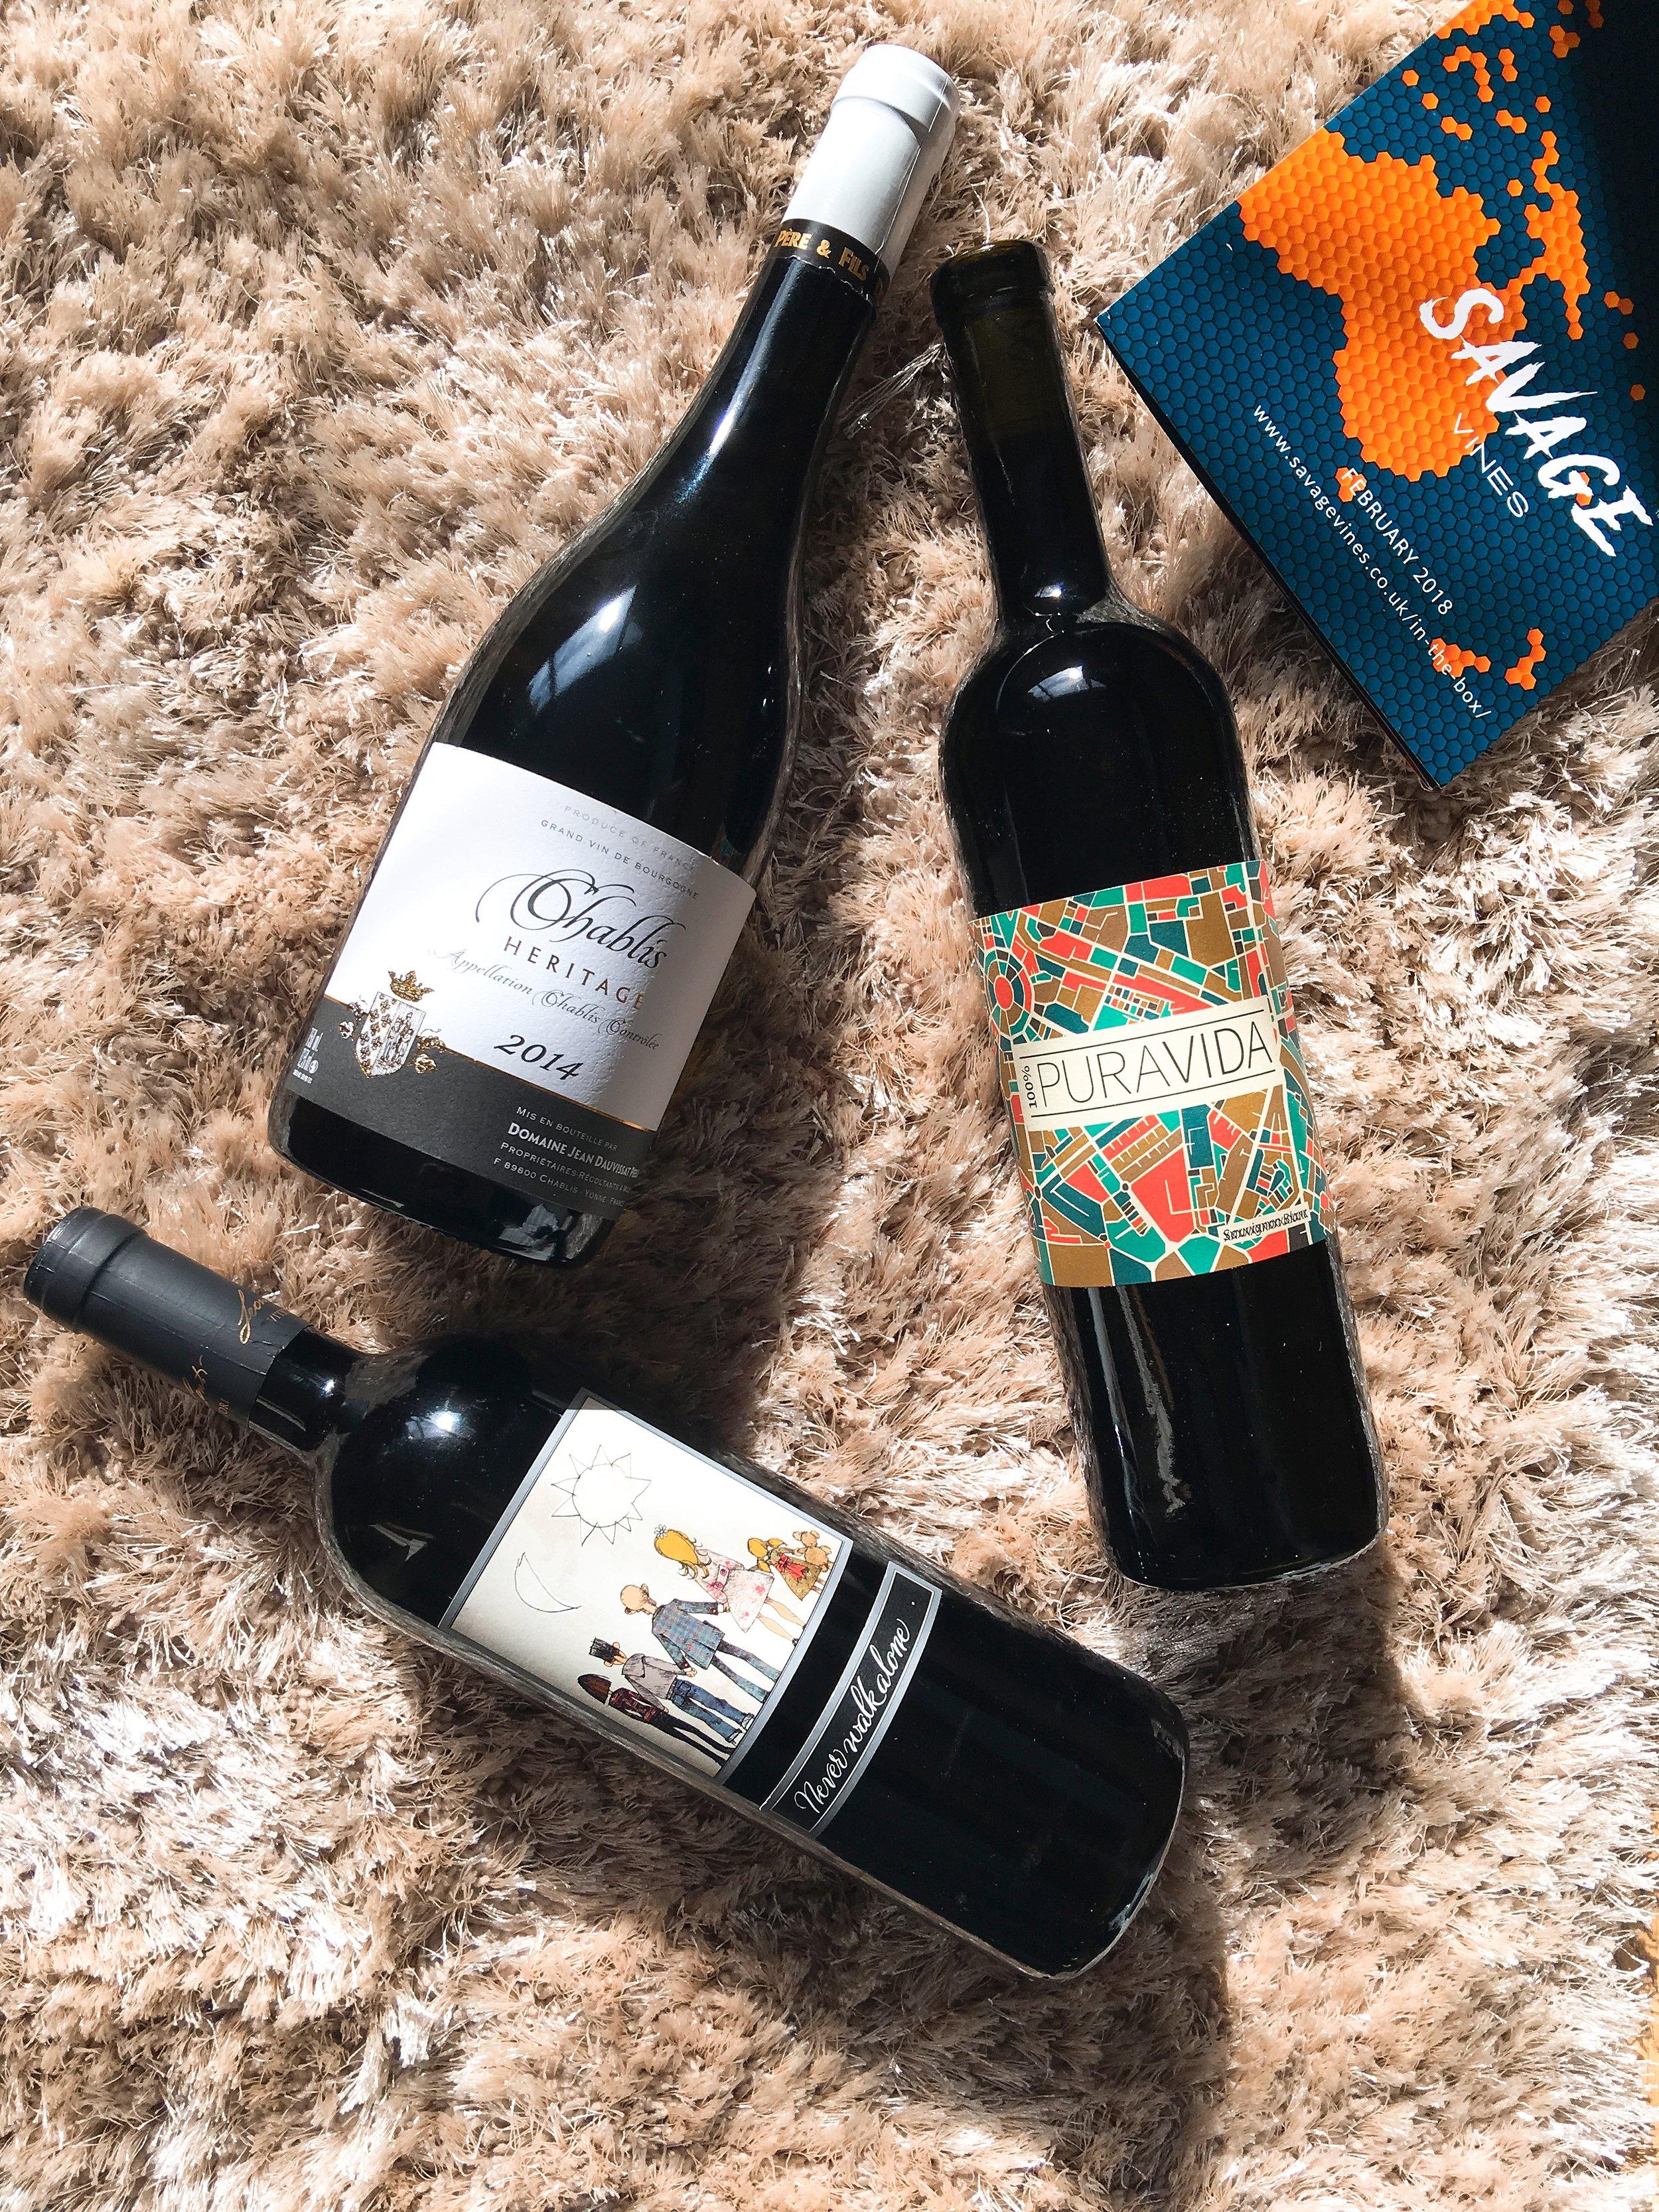 Savage wines review